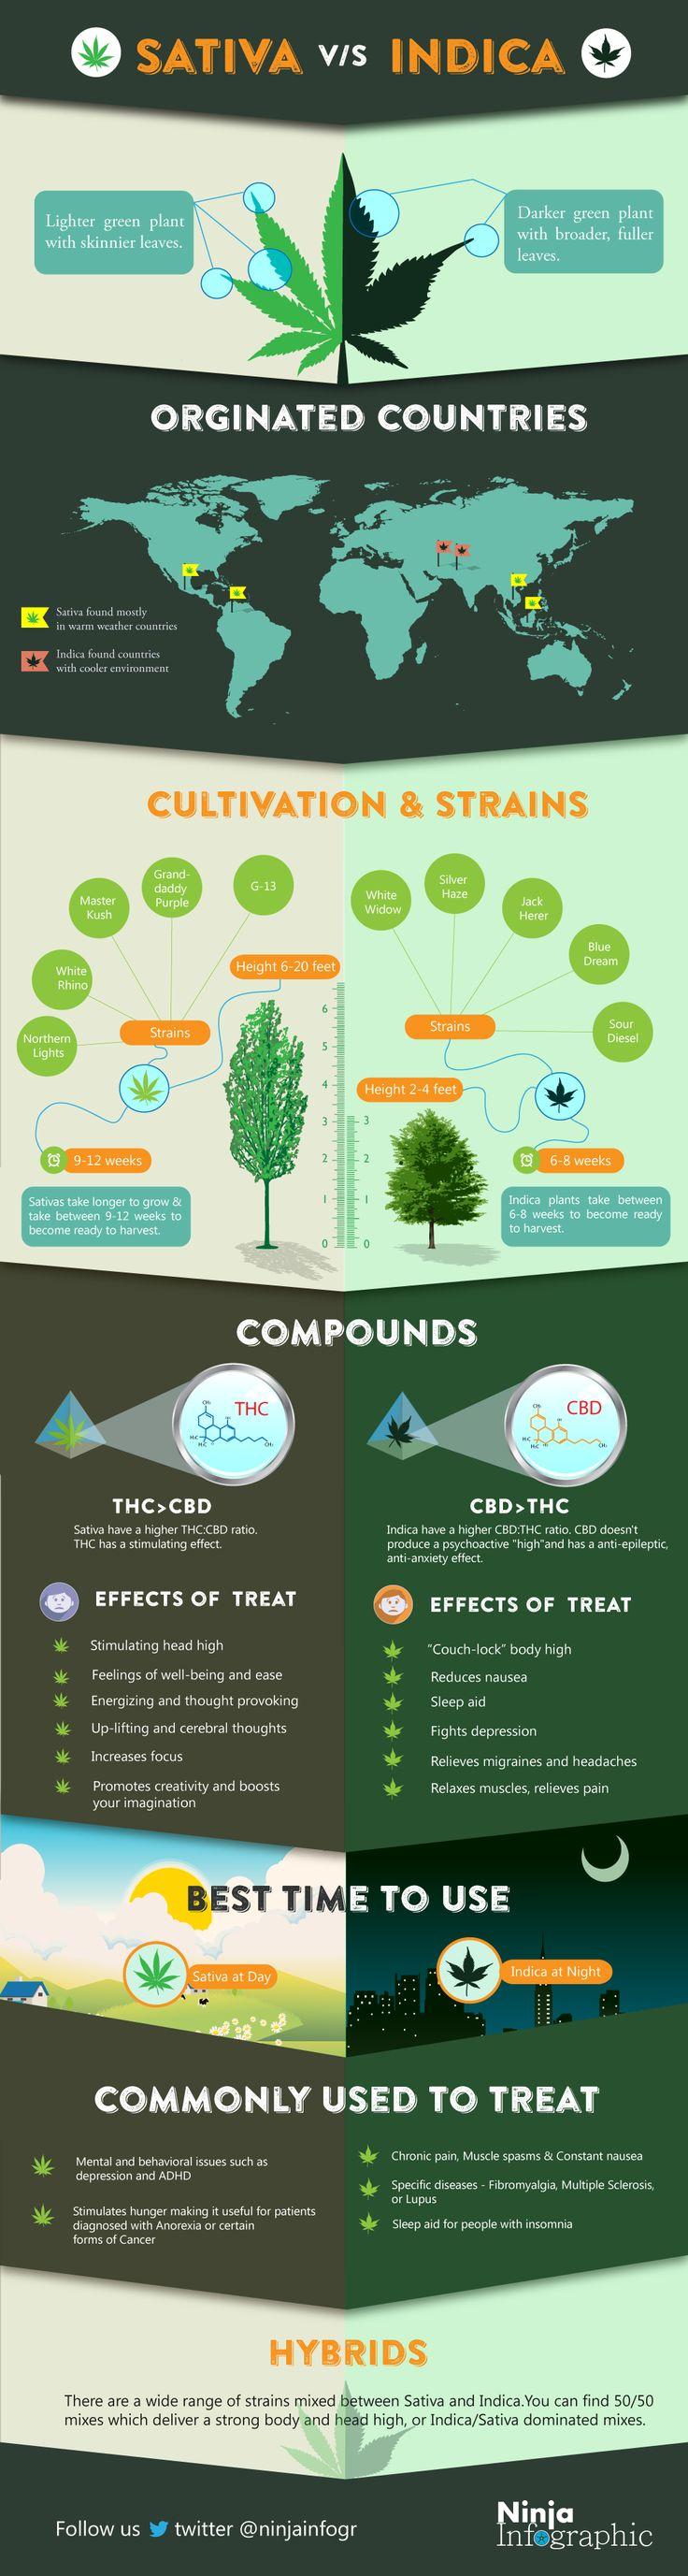 Sativa vs Indica    #infographic #Marijuana #Drugs